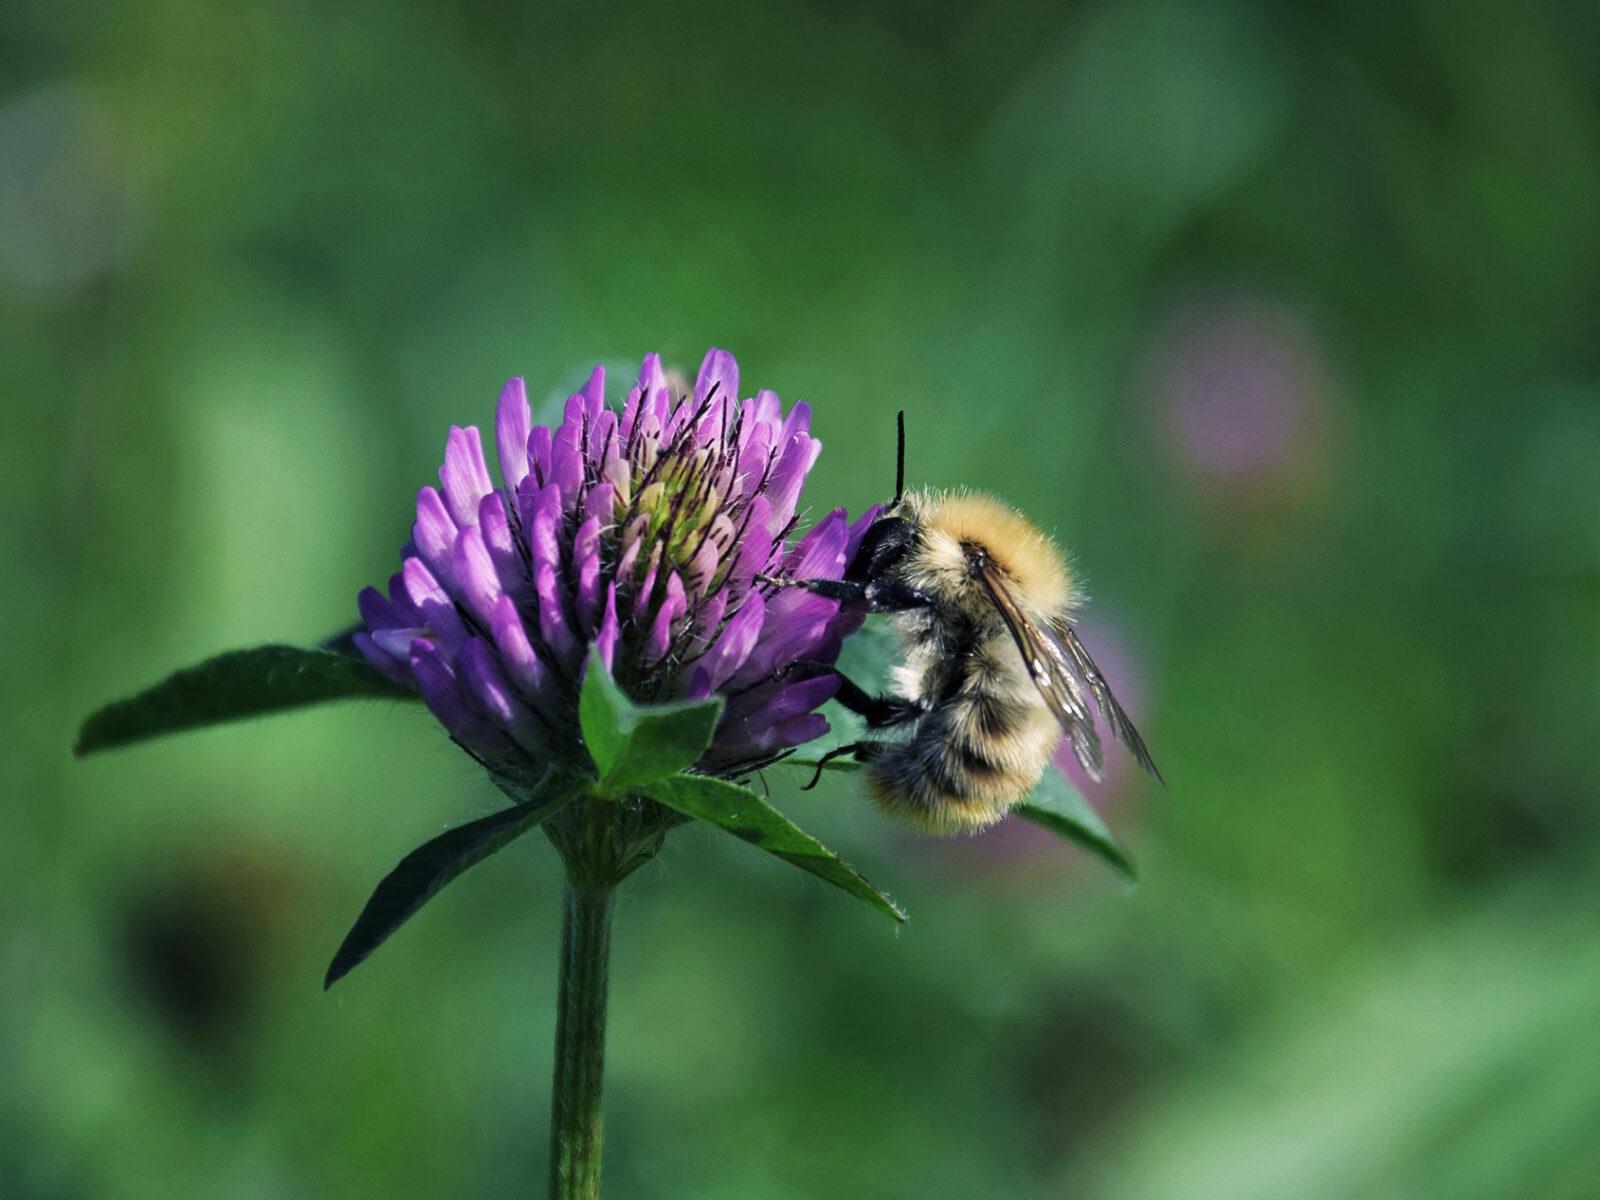 bi, humla, klöver, pollinering